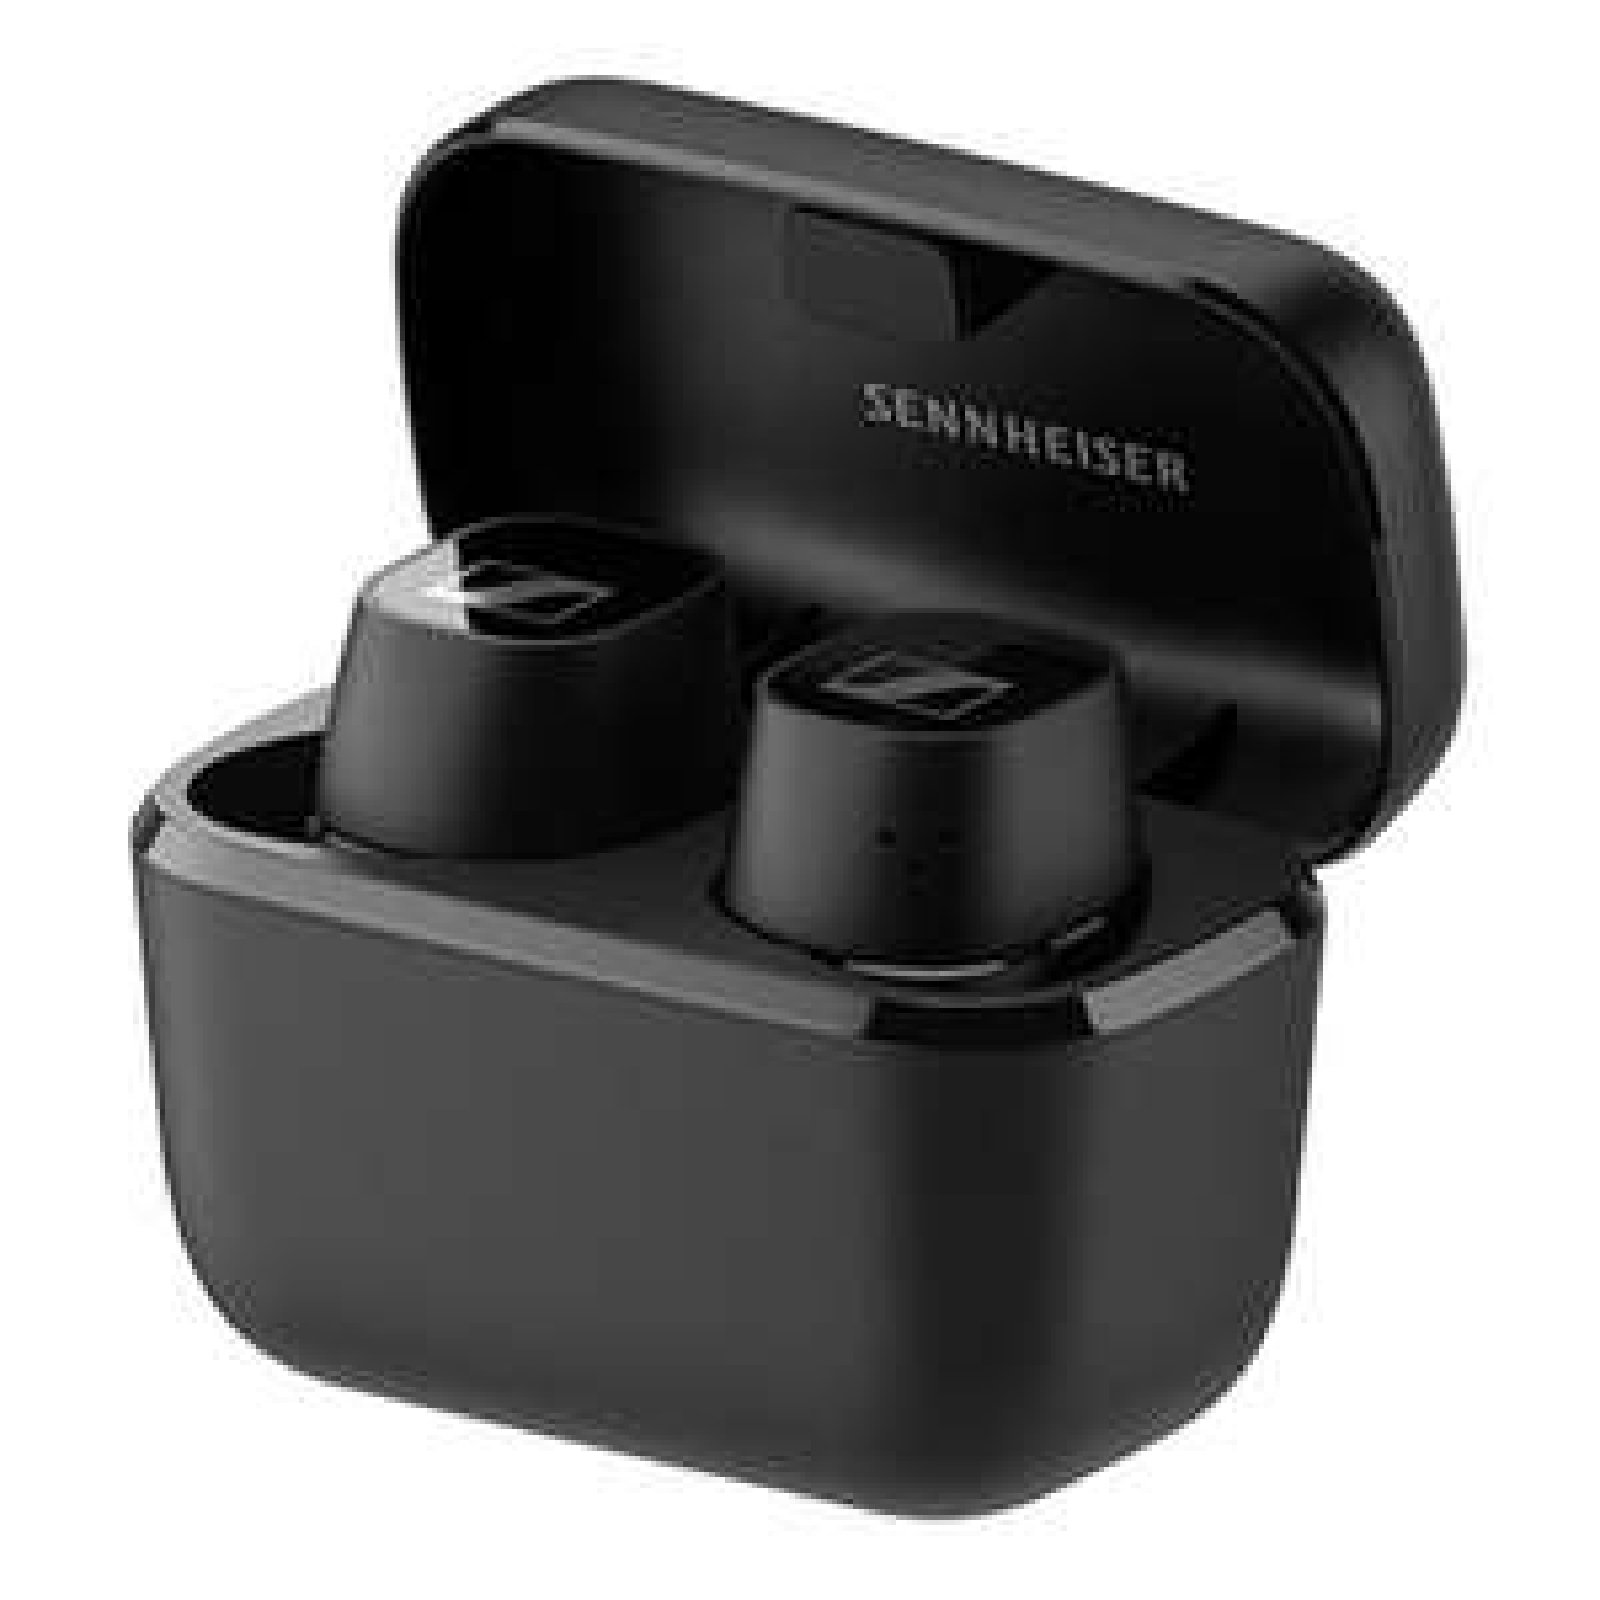 [Étudiants] Écouteurs sans fil Sennheiser CX 400BT - TWS, Bluetooth 5.1, aptX